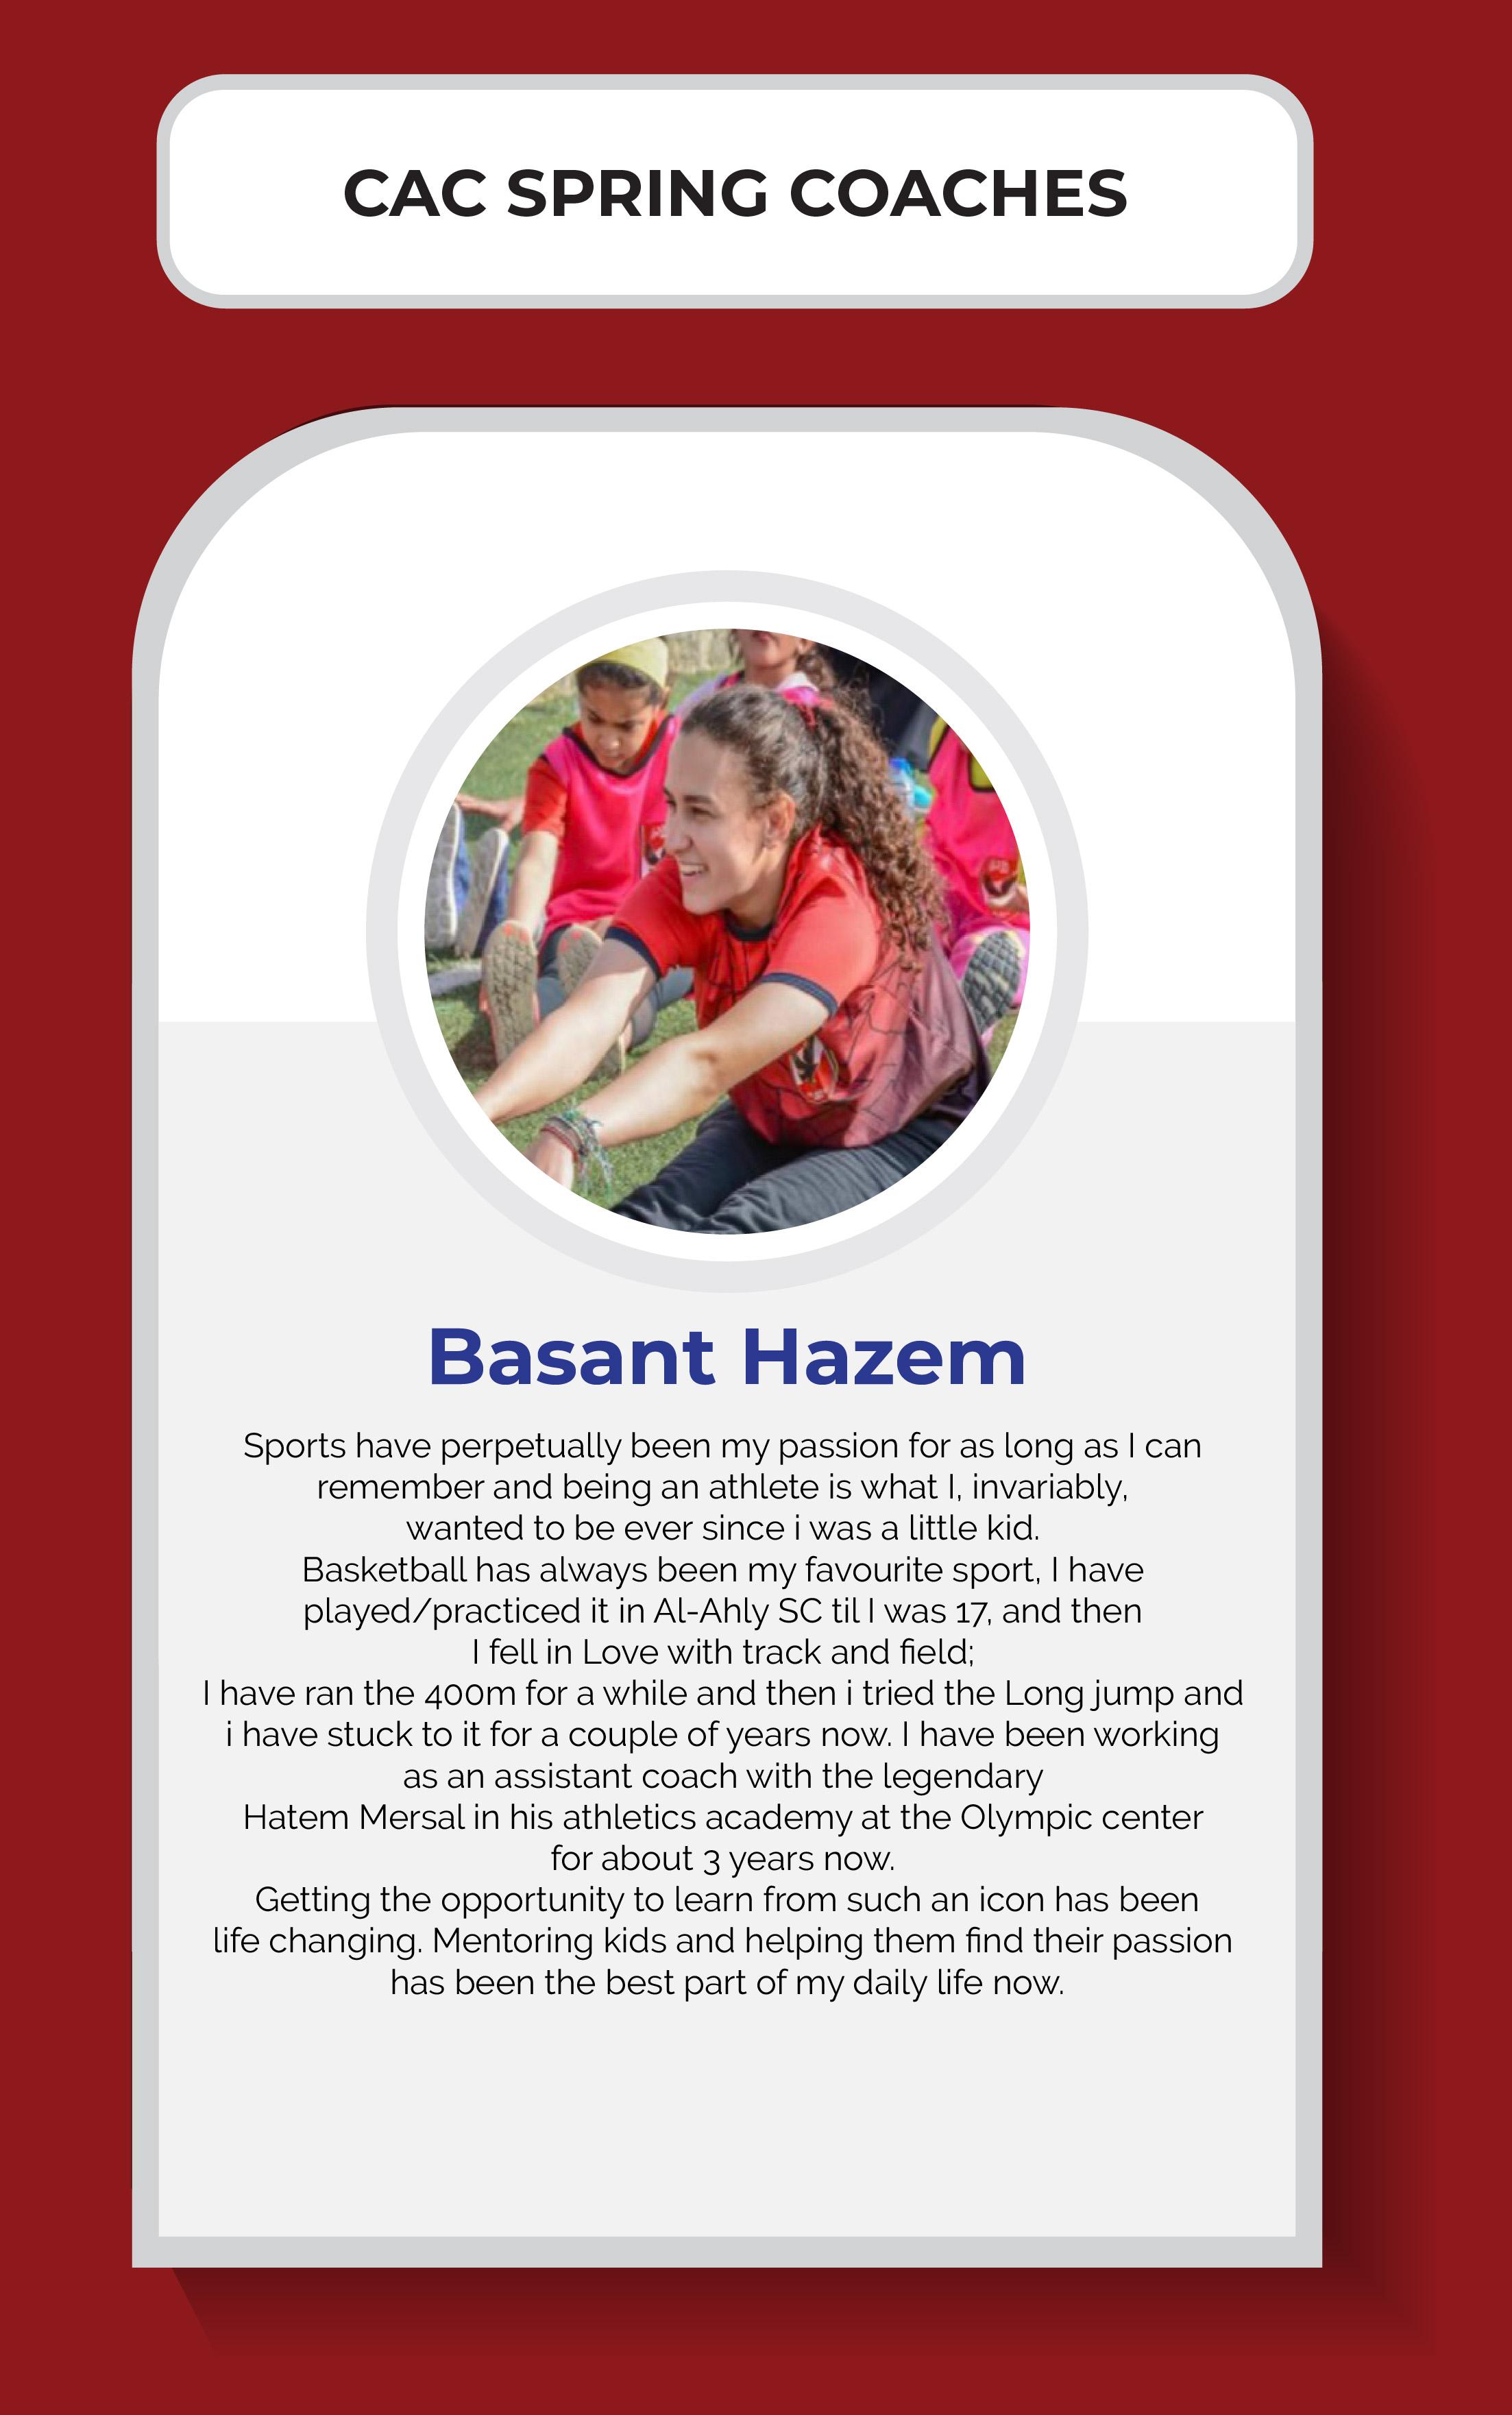 BasantHazem-01